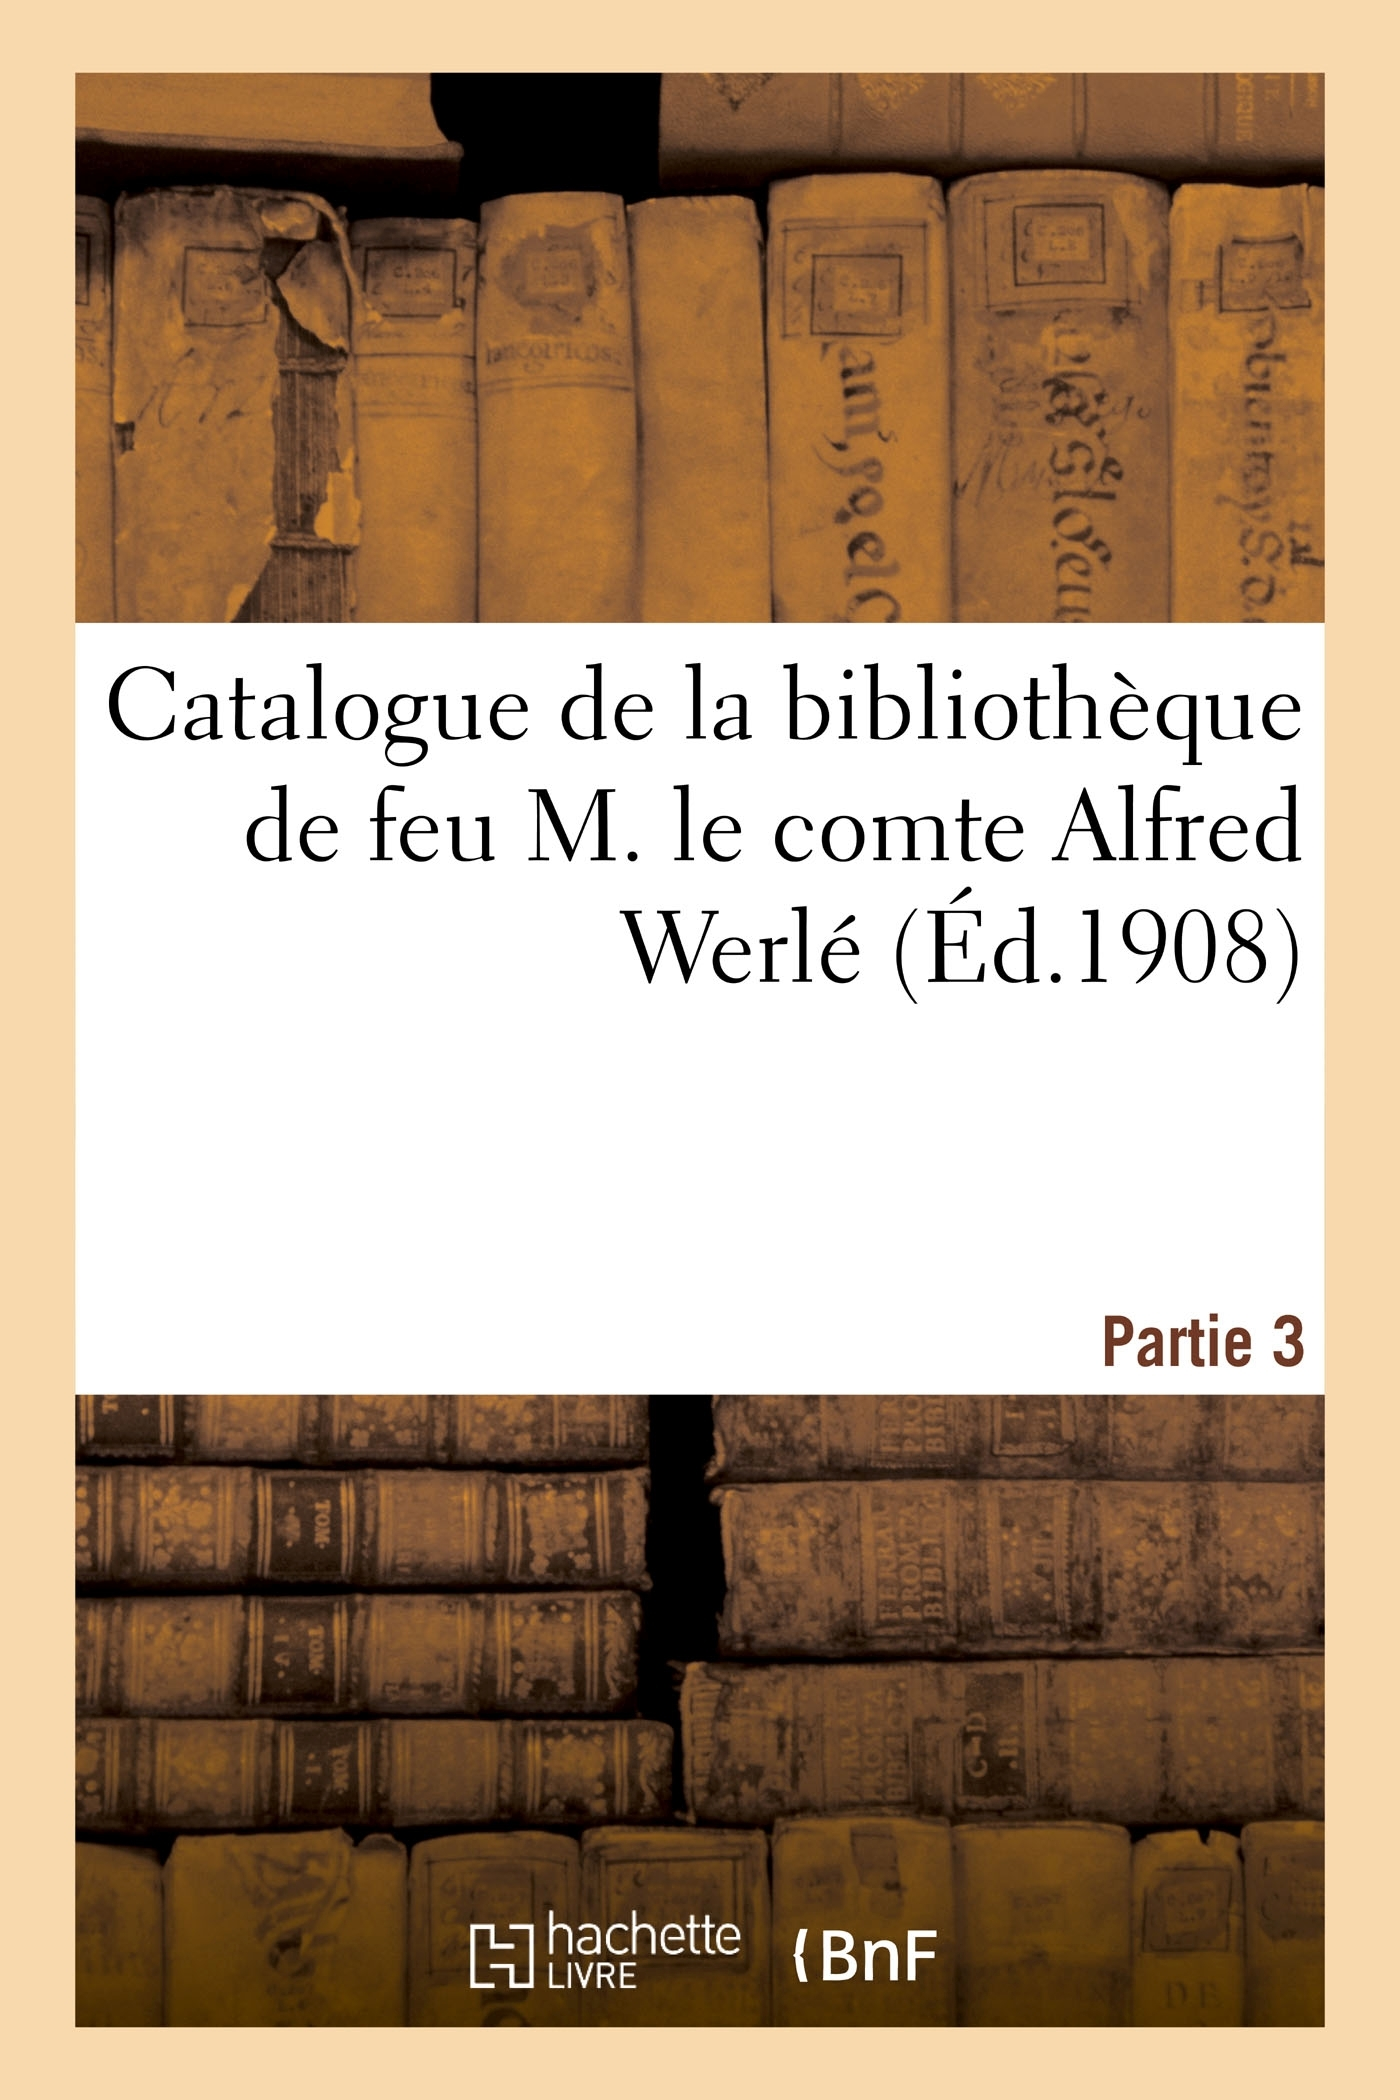 CATALOGUE DE LA BIBLIOTHEQUE DE FEU M. LE COMTE ALFRED WERLE. PARTIE 3